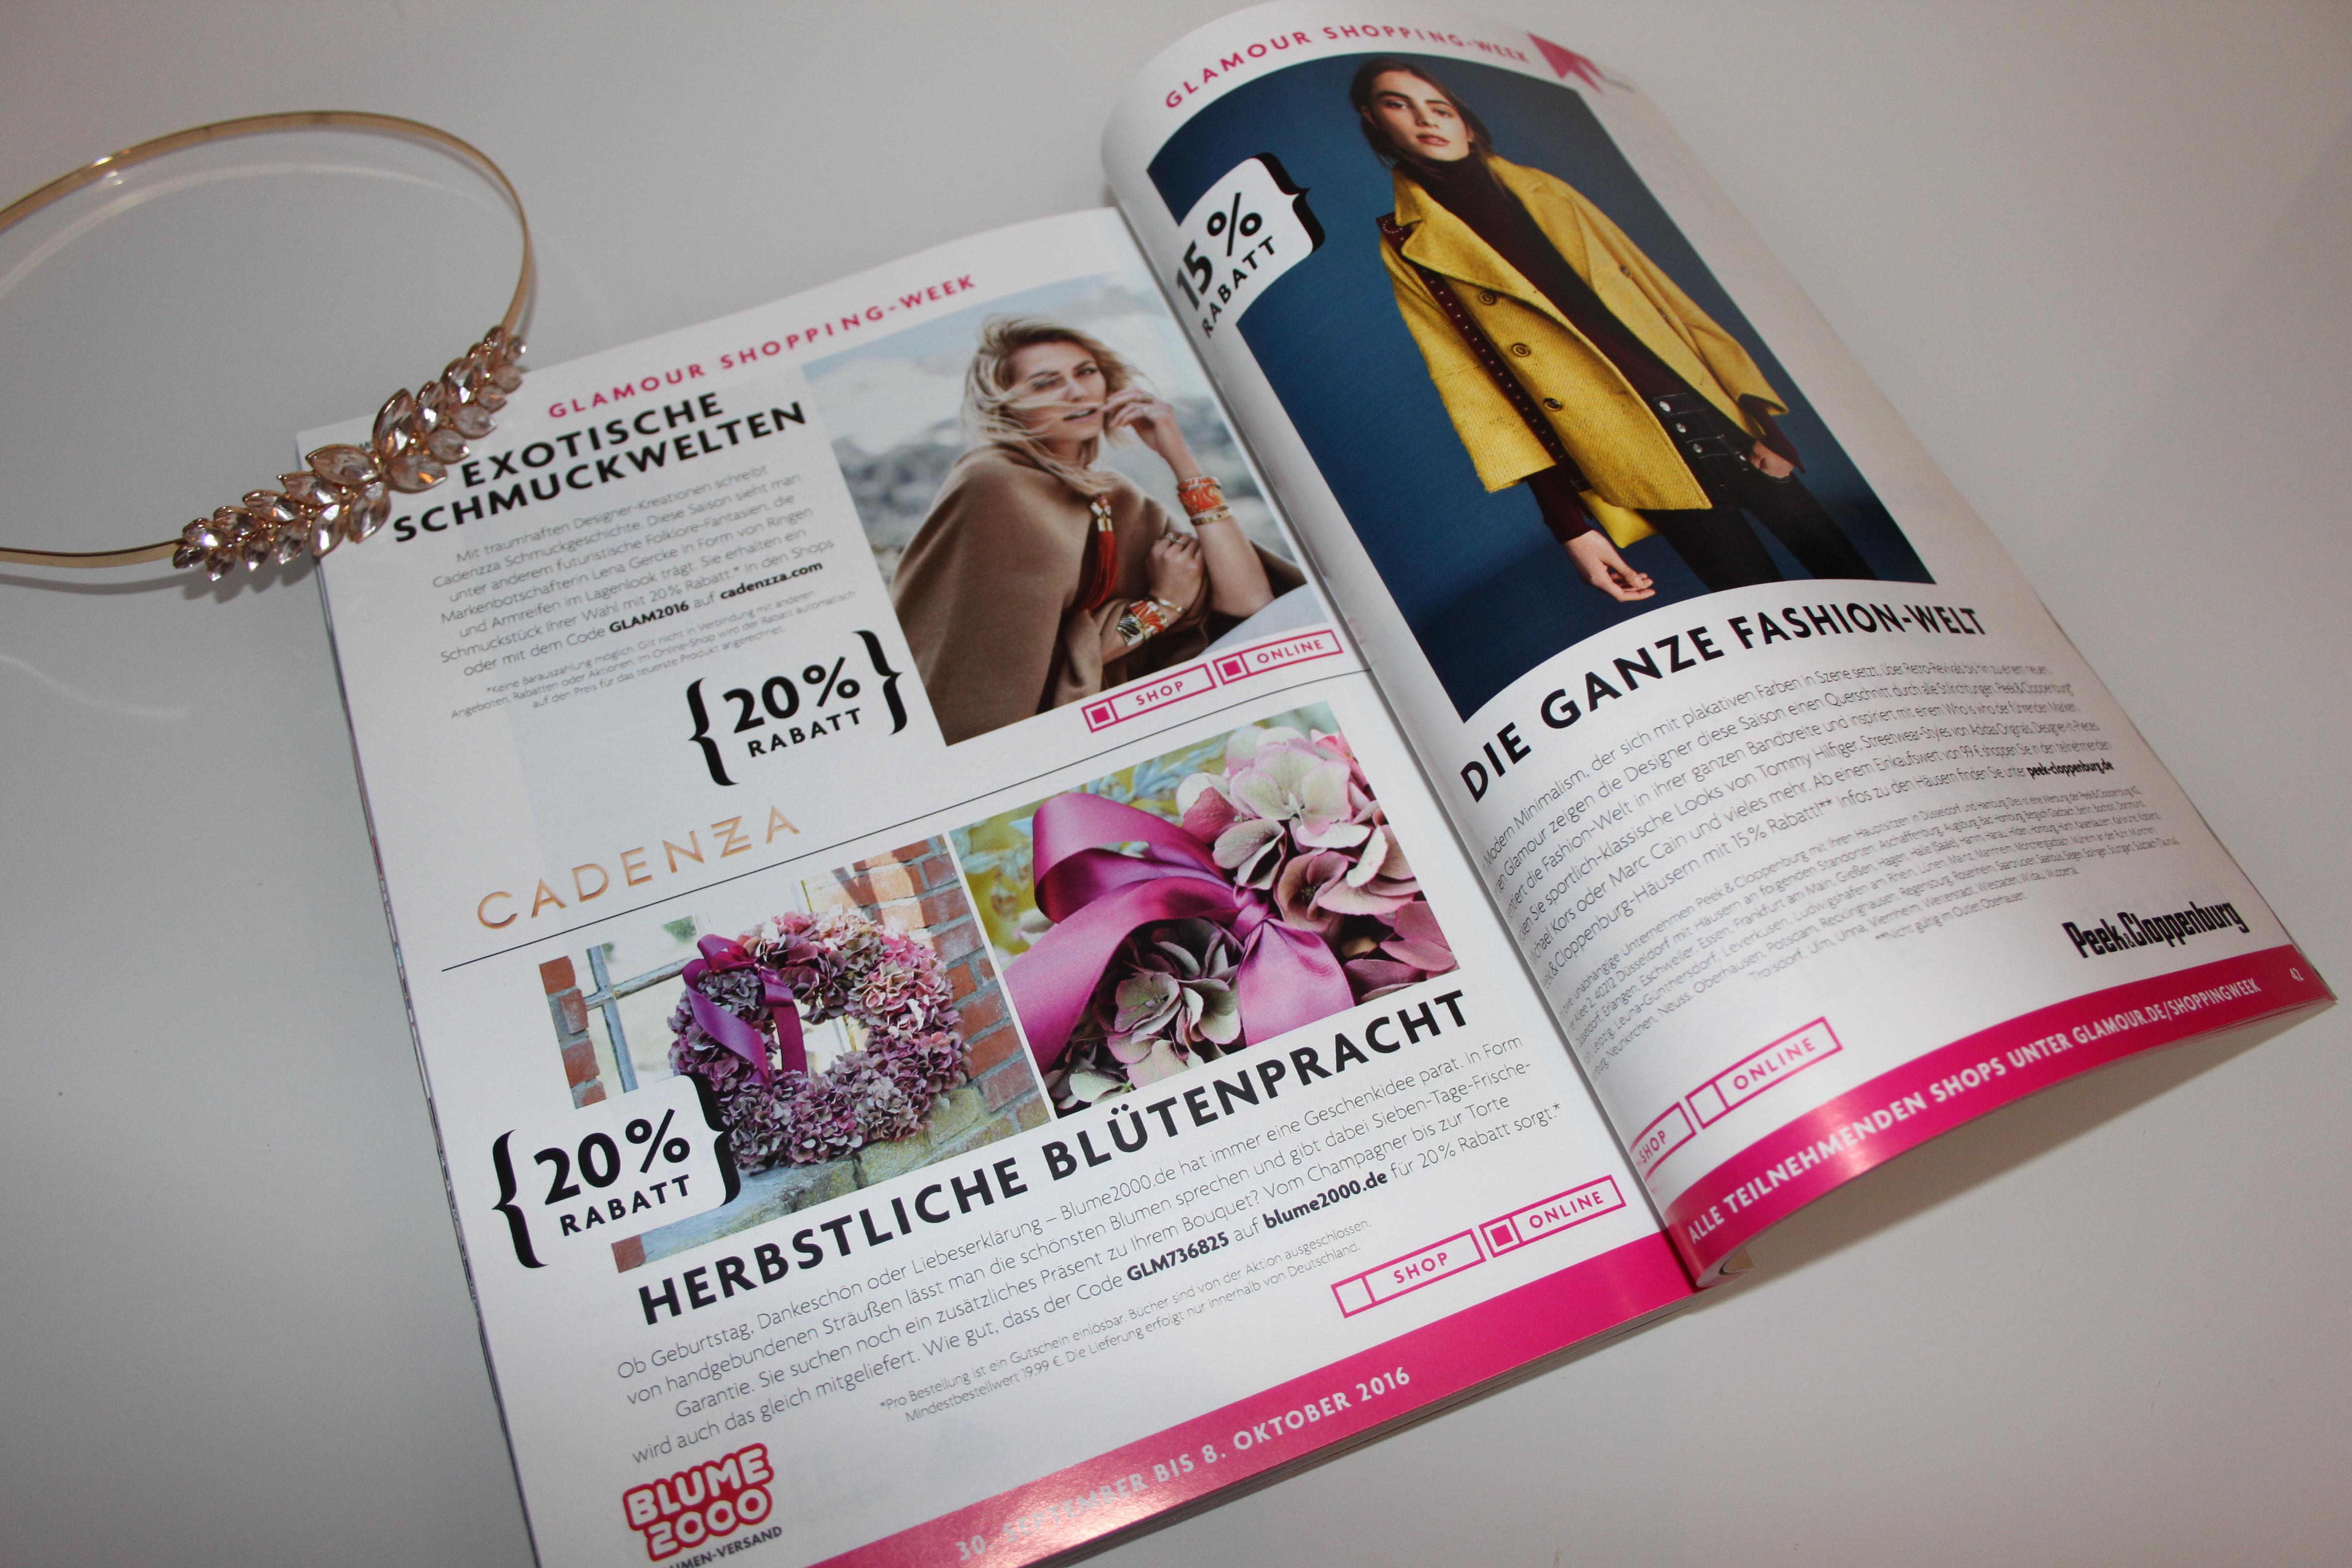 Glamour Shopping Week Herbst 2016 - Inhalt